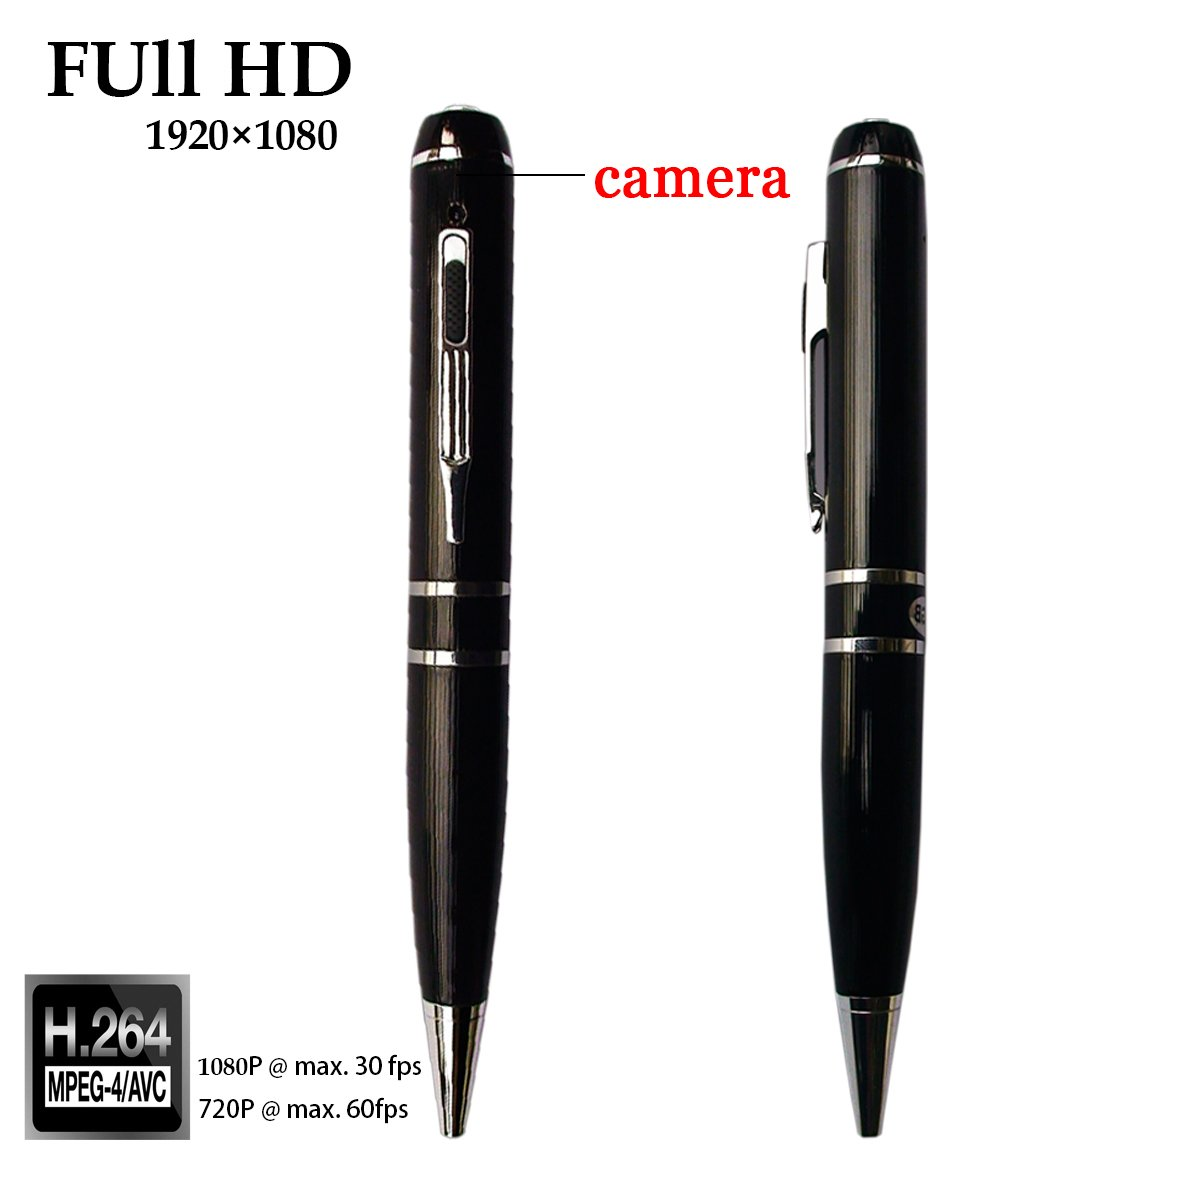 SUNMENCO Full HD 1080P Mini videoc/ámara Pen c/ámara de grabaci/ón de v/ídeo Plug and Play Extreme Pen Oculto c/ámaras DVR grabadora multifunci/ón 16 GB//32 GB de Memoria integrada